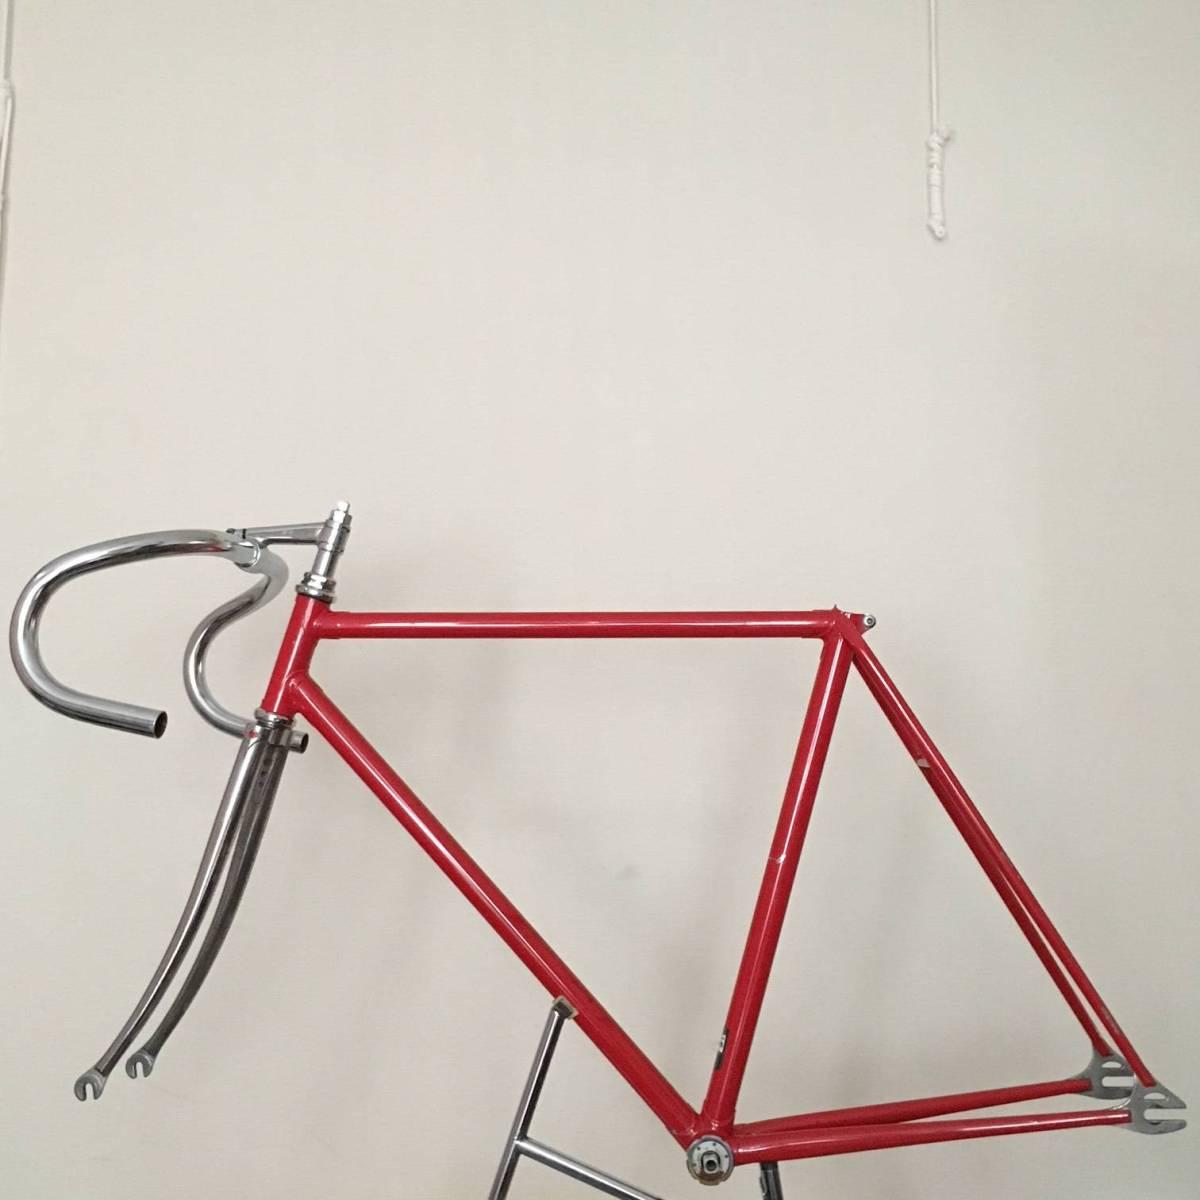 piste frame bicycle race nagasawa bicycle Kuromori single NJS ...